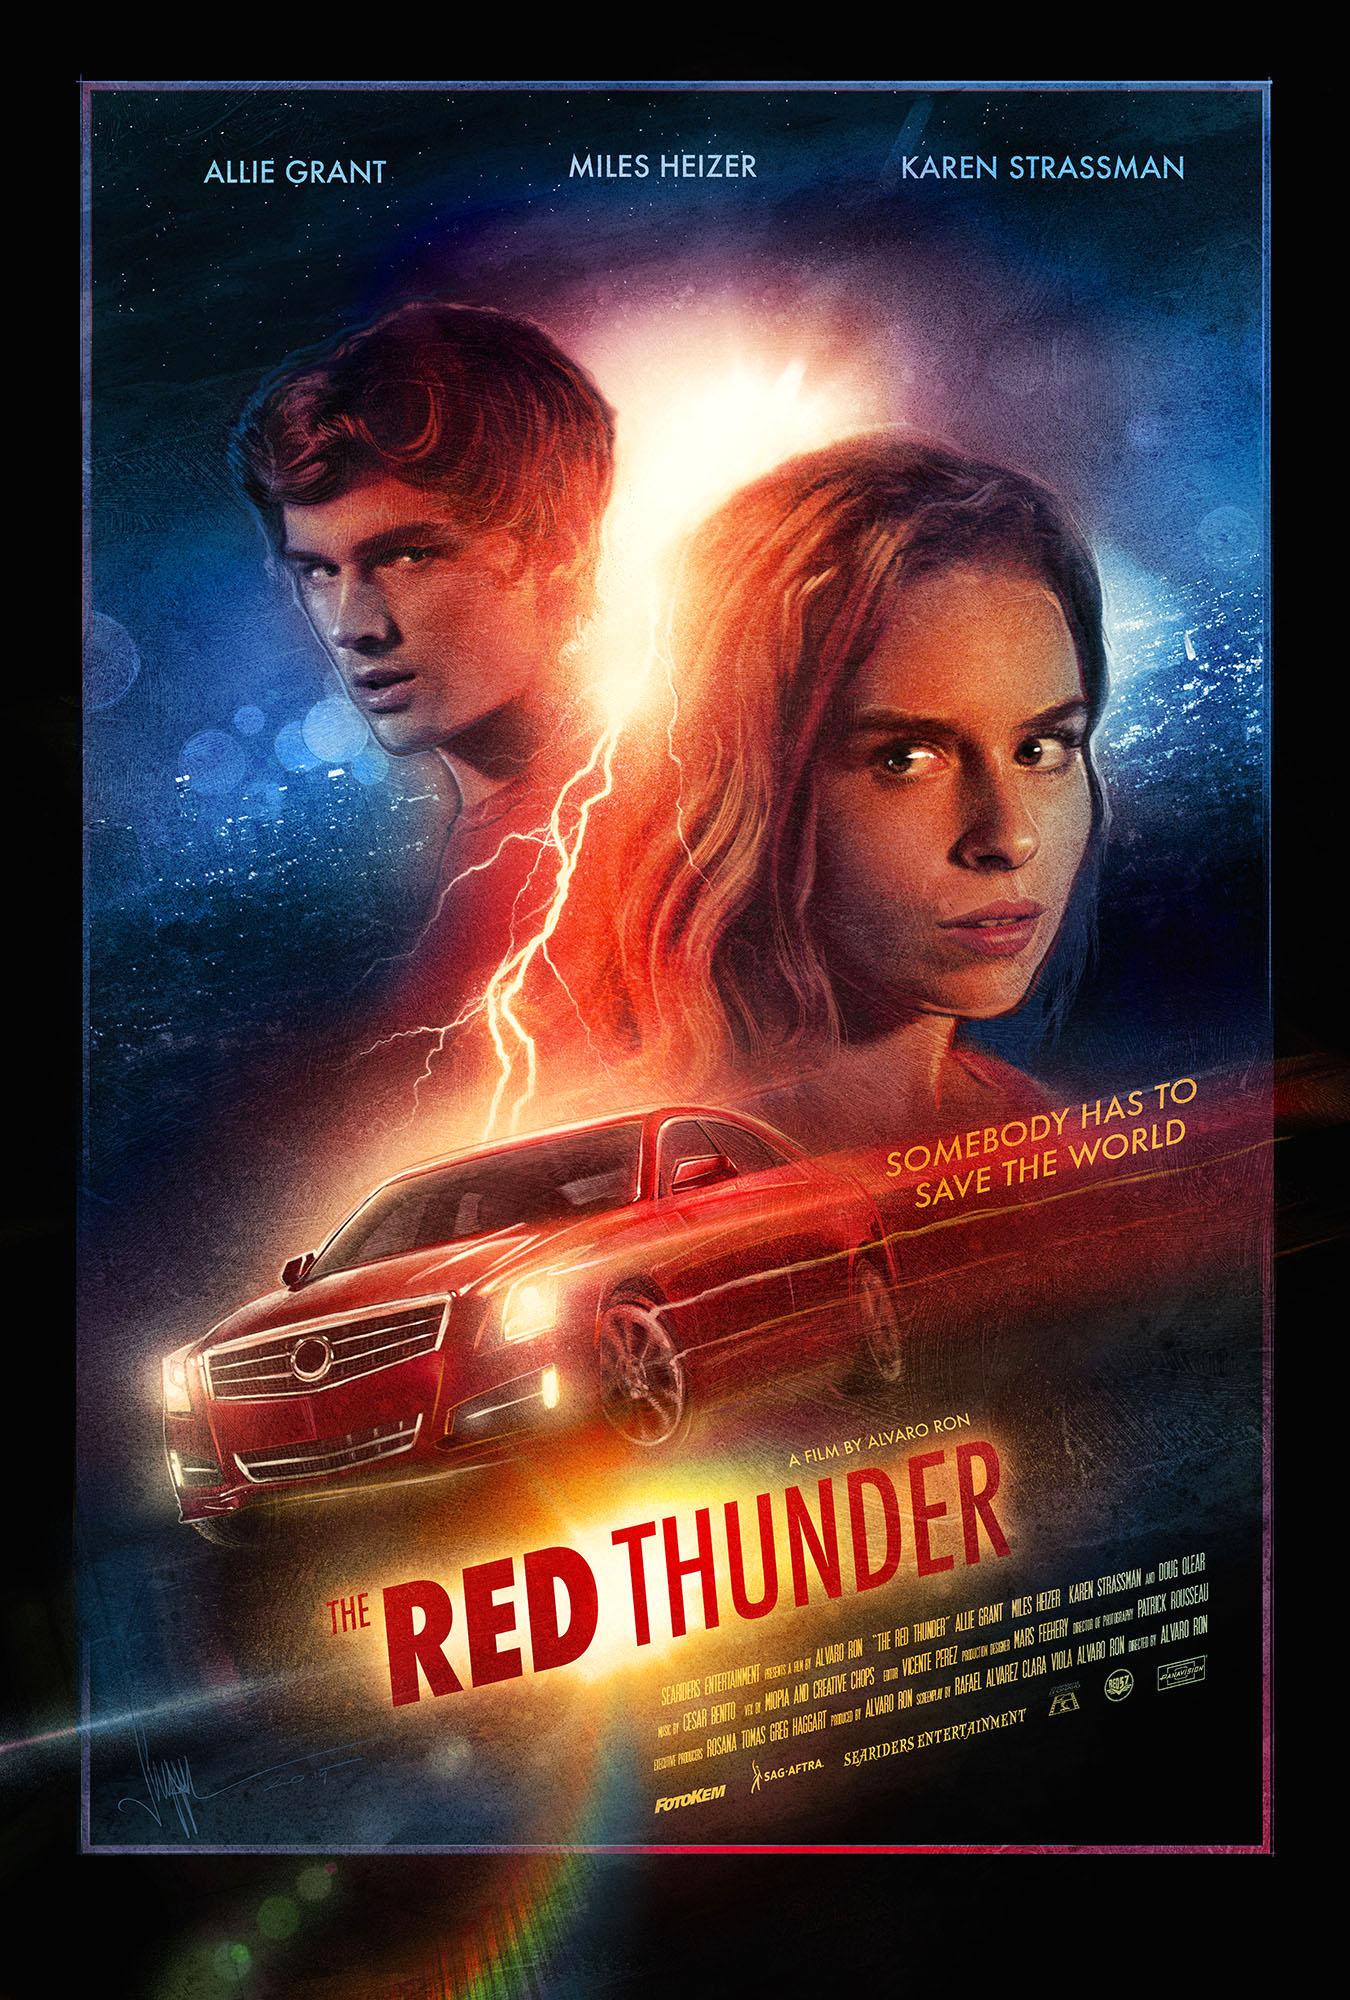 TheREDTHUNDER_poster